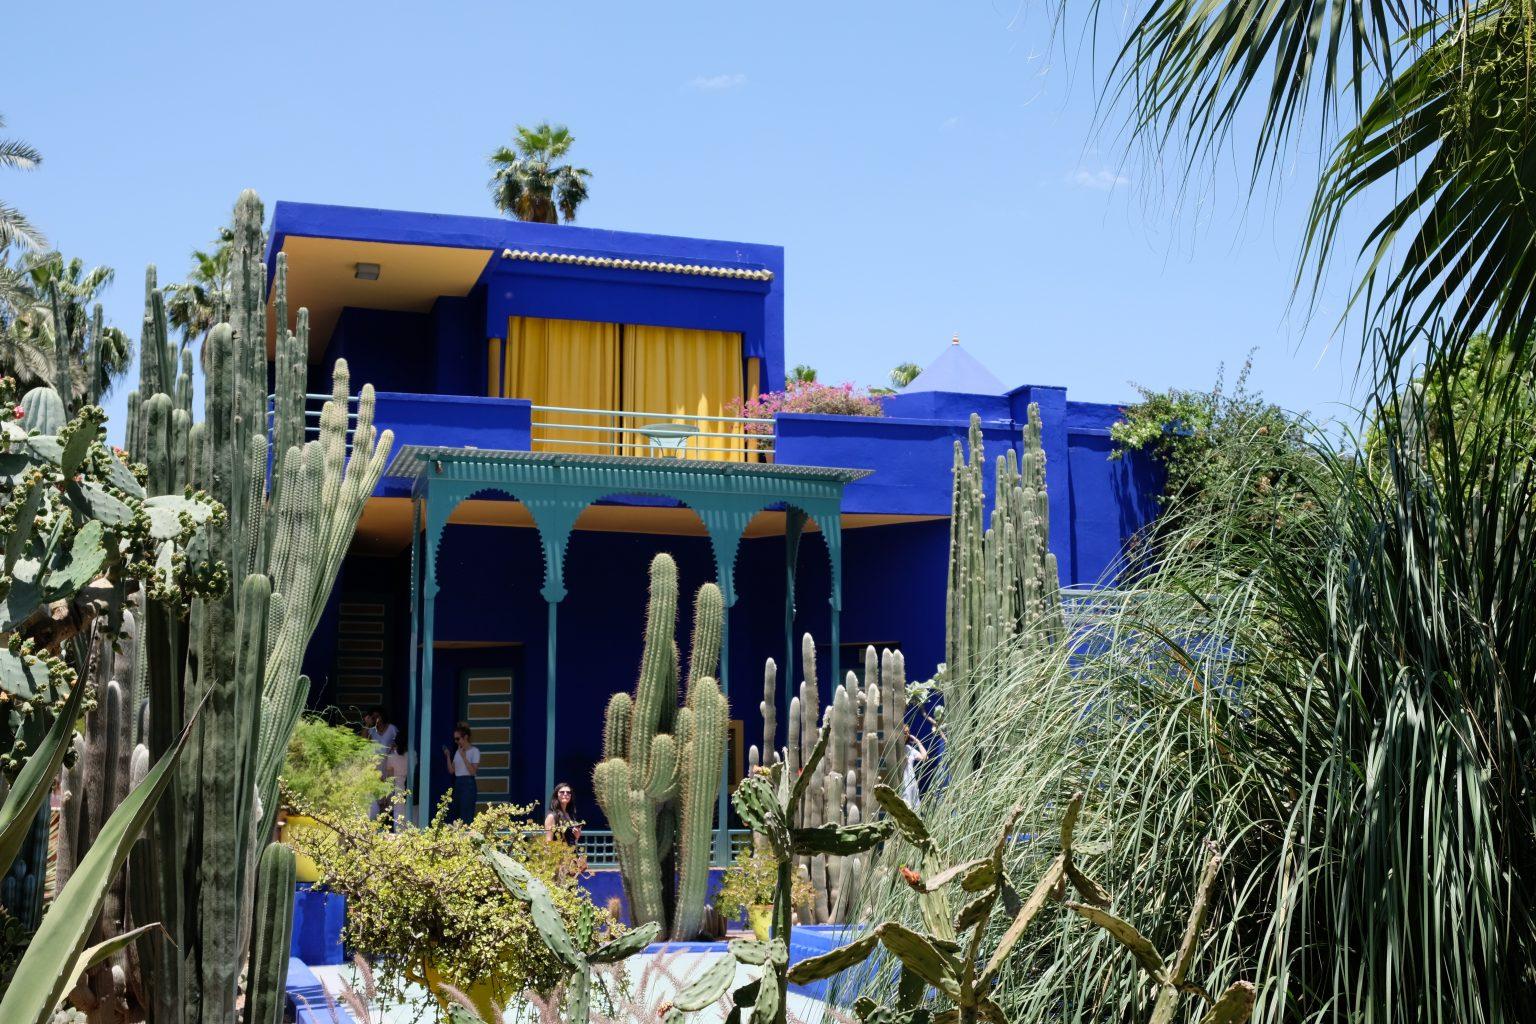 morocco-jardin-majorelle-1536x1024.jpg